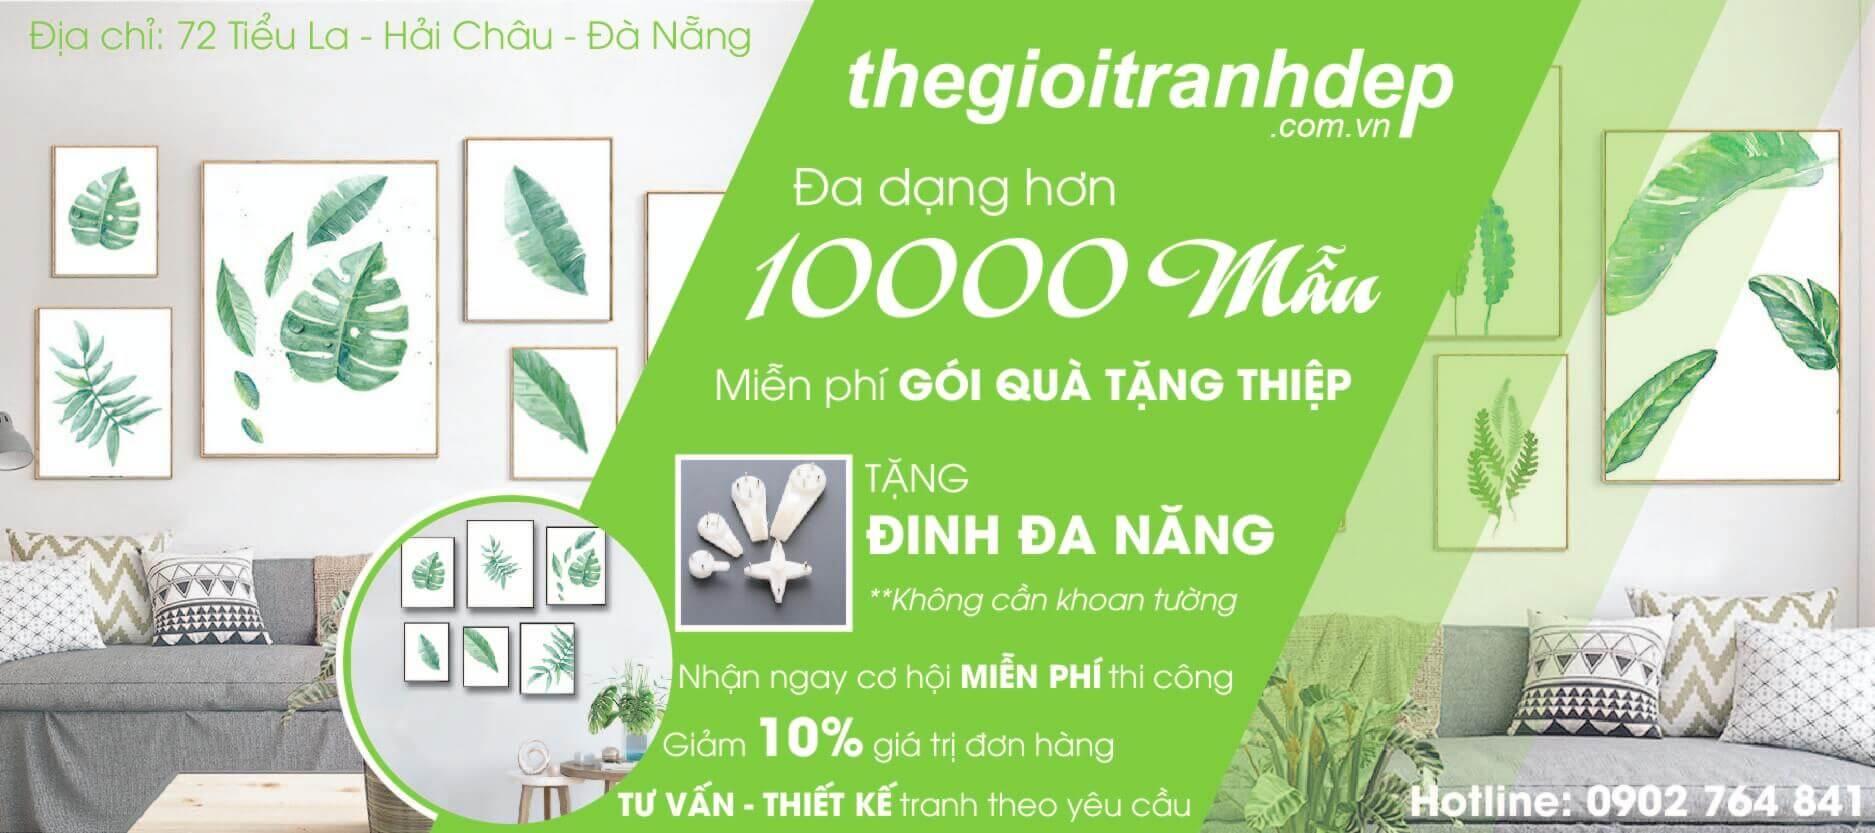 thegioitranhdep01